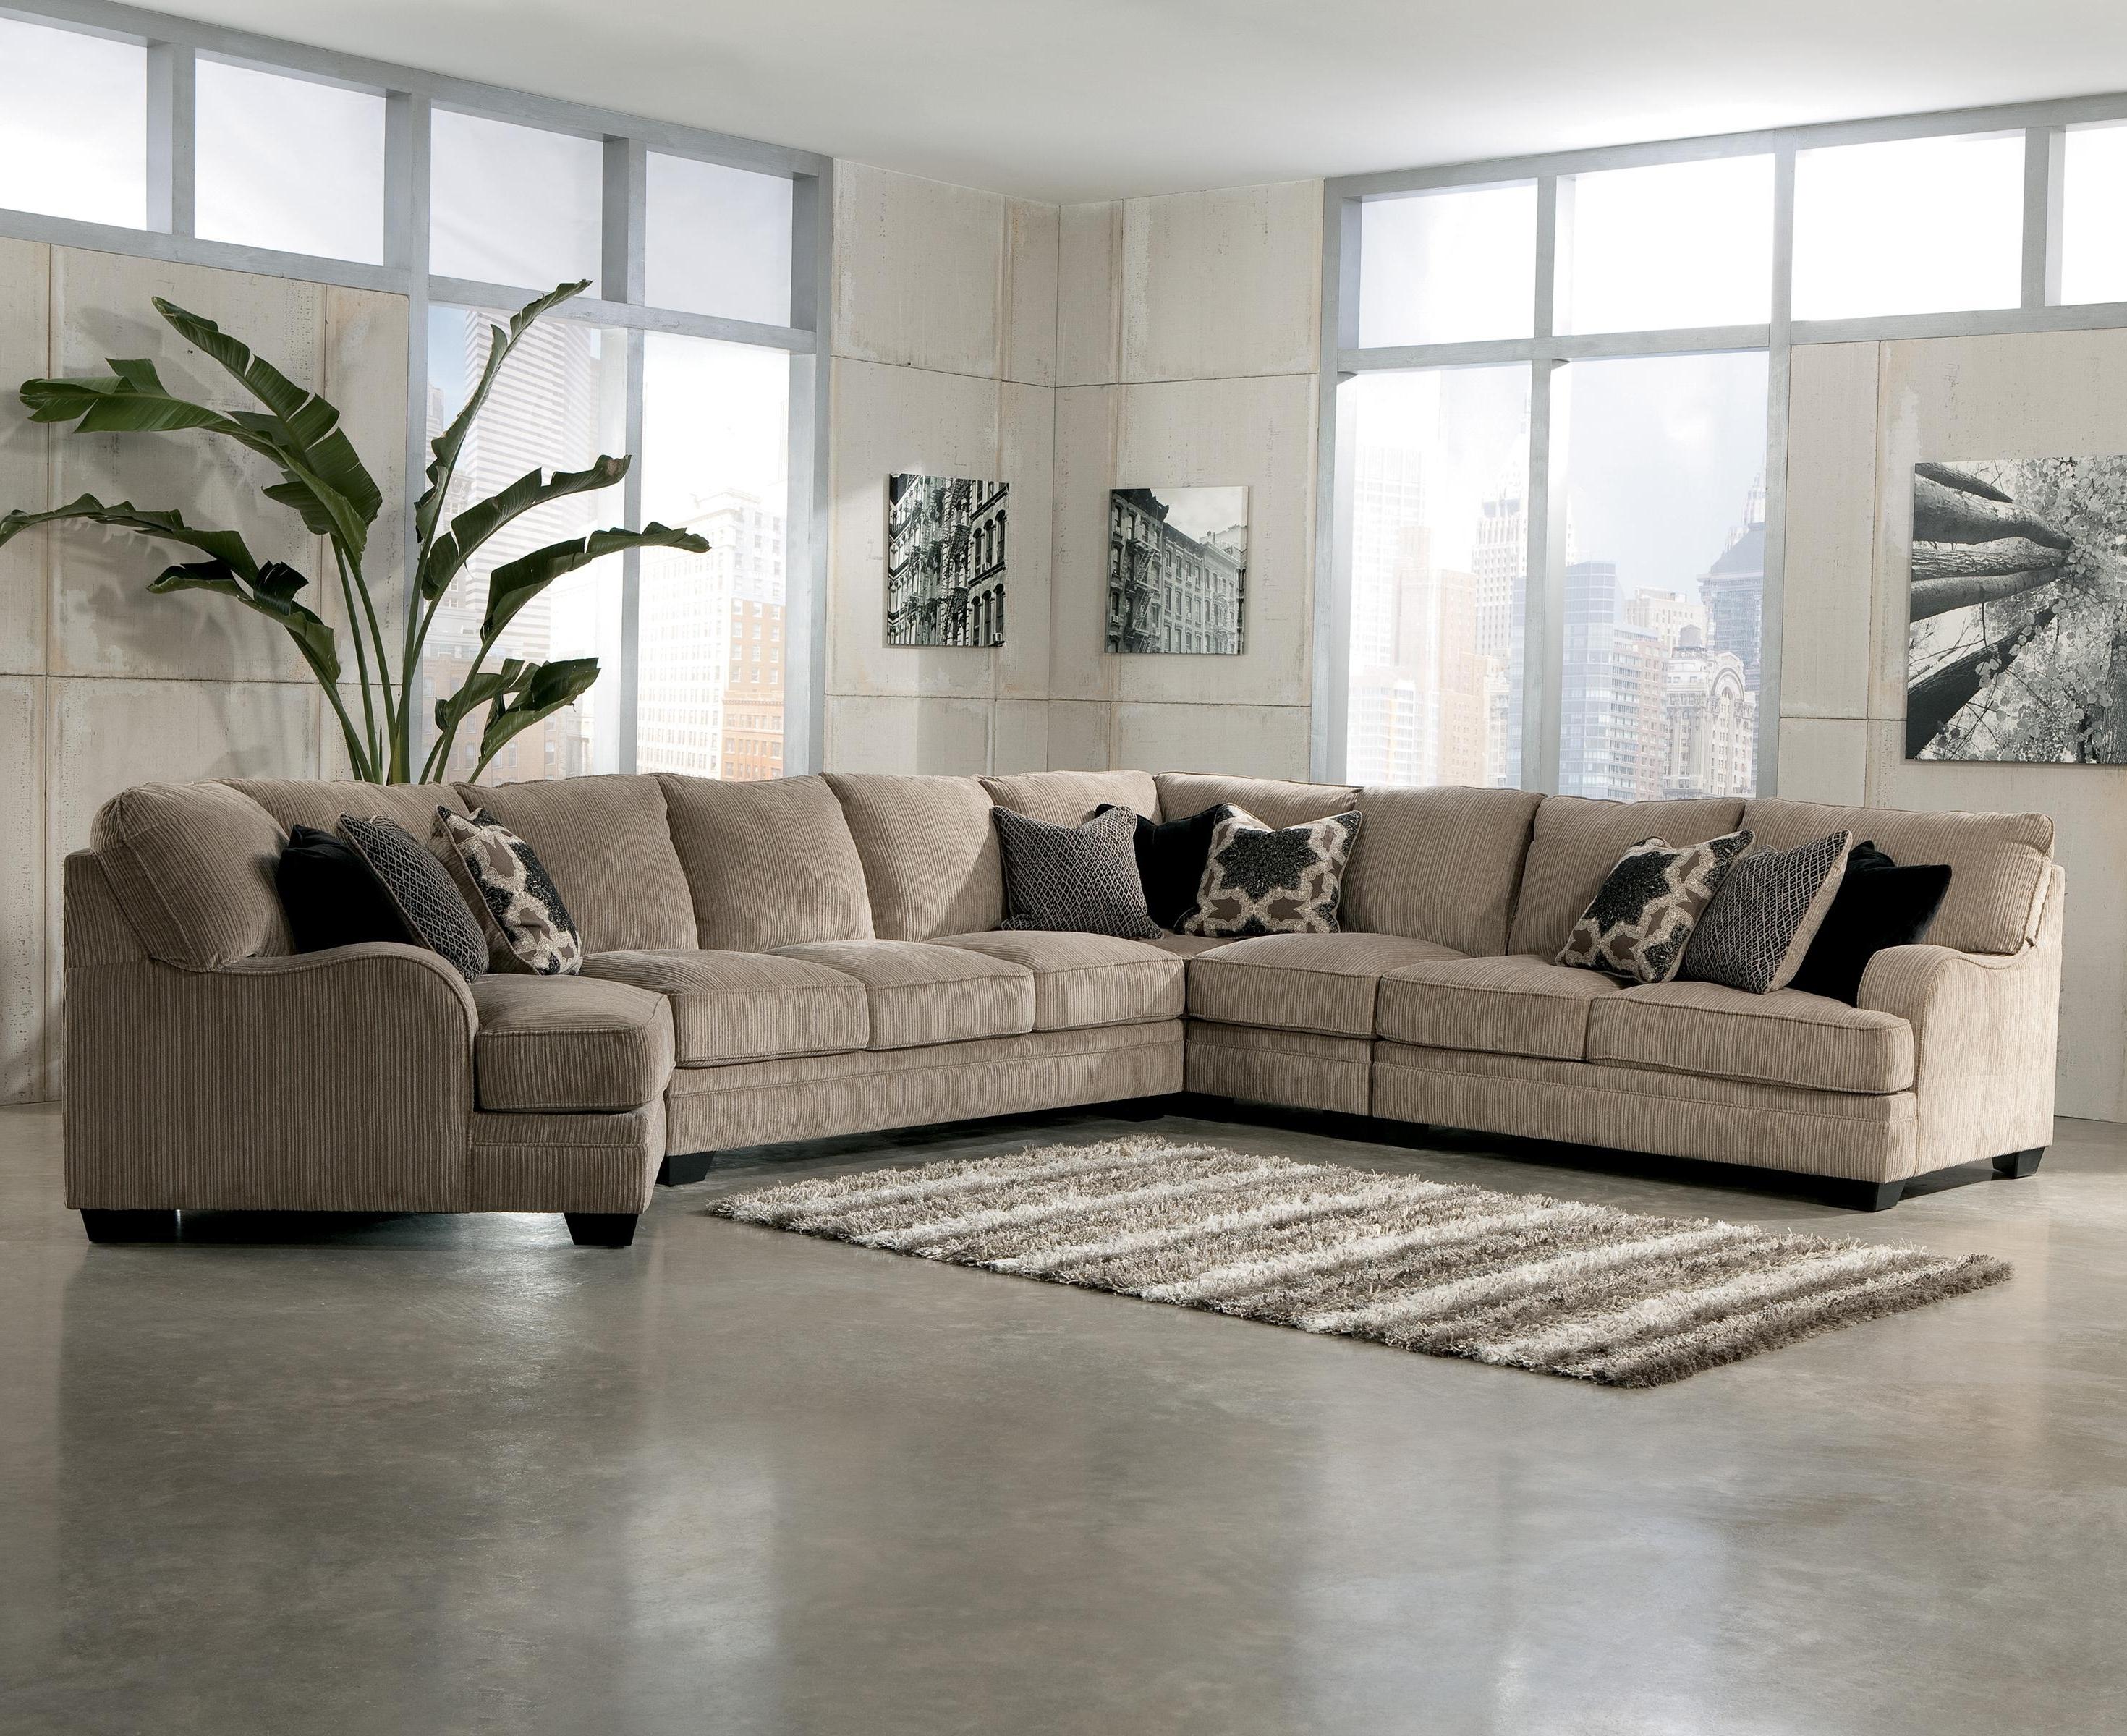 Current Signature Designashley Katisha – Platinum 5 Piece Sectional Regarding Home Furniture Sectional Sofas (View 5 of 15)